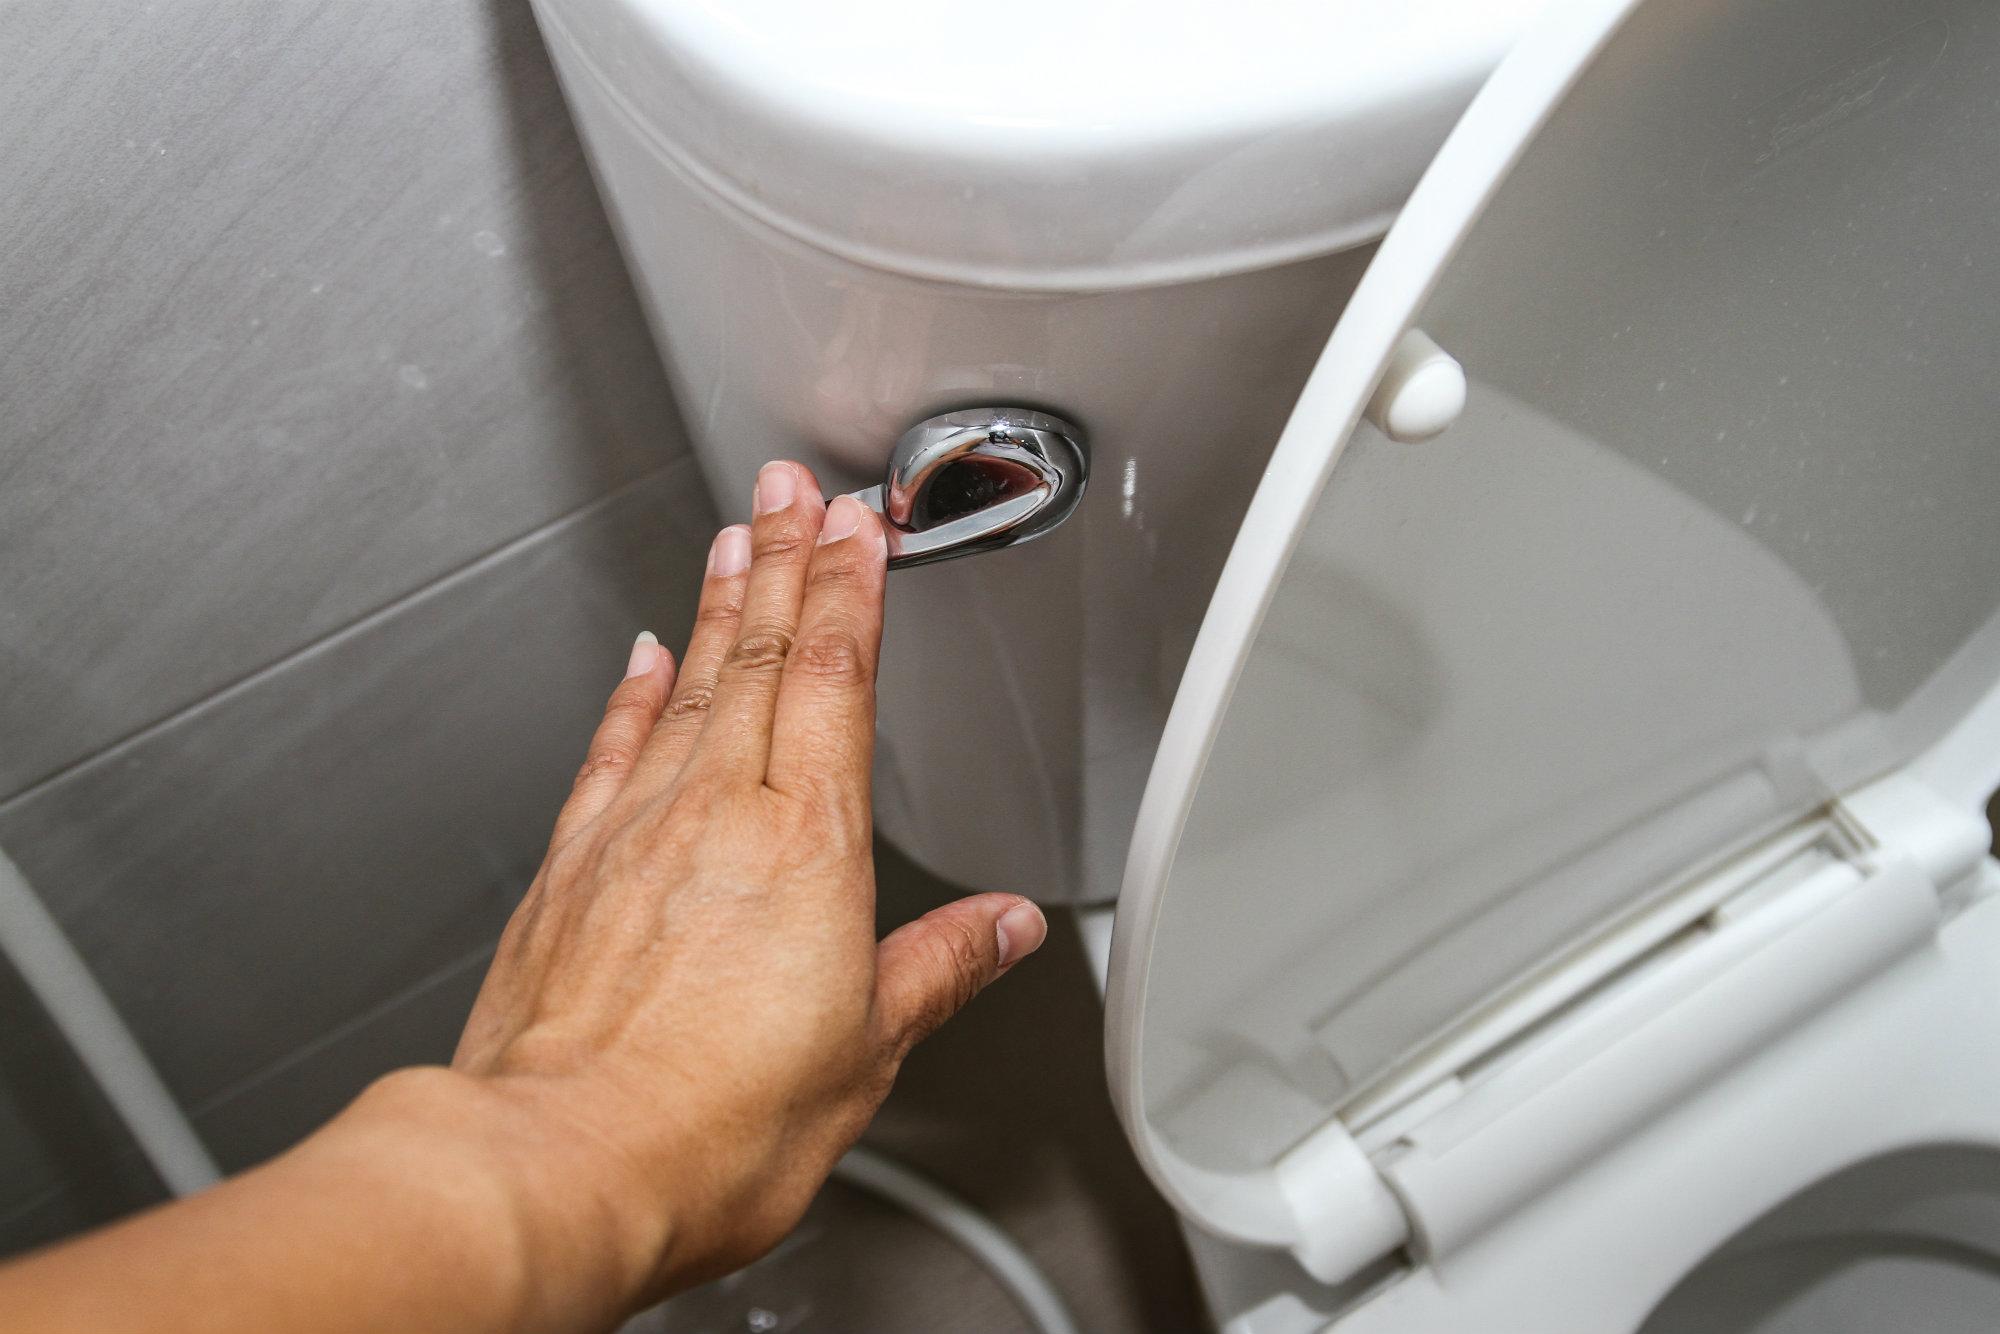 Don U0026 39 T Flush Your Drugs Down The Toilet